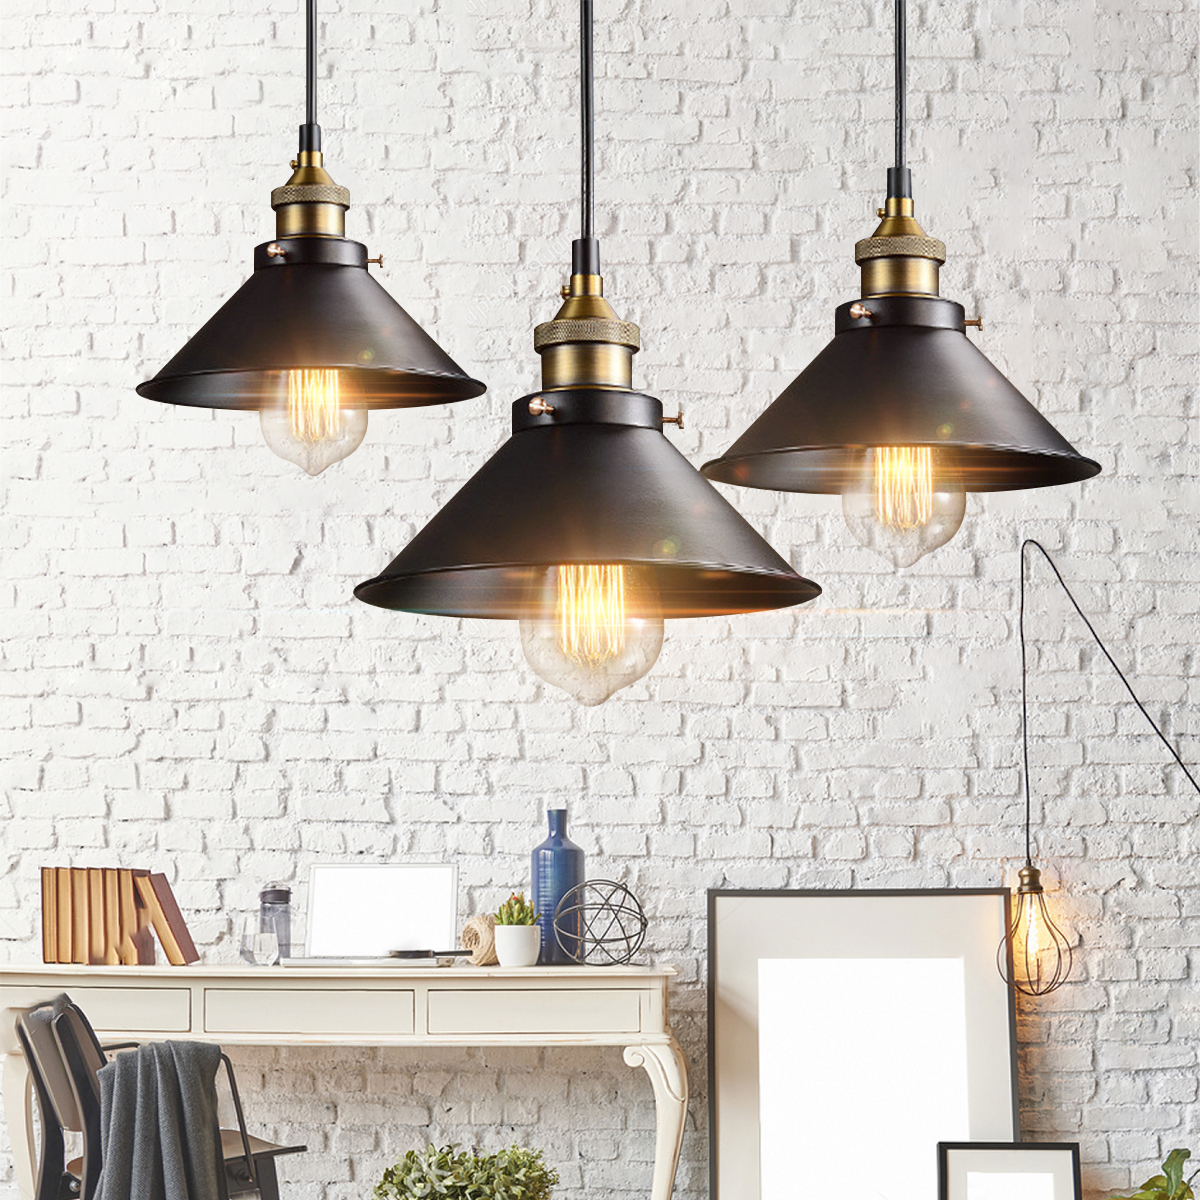 Loft Vintage Pendant Light Nordic Retro Iron Lights Industrial Edison Lamp Lighting Fixture For Cafe Bar Home Lighting Tezonnix